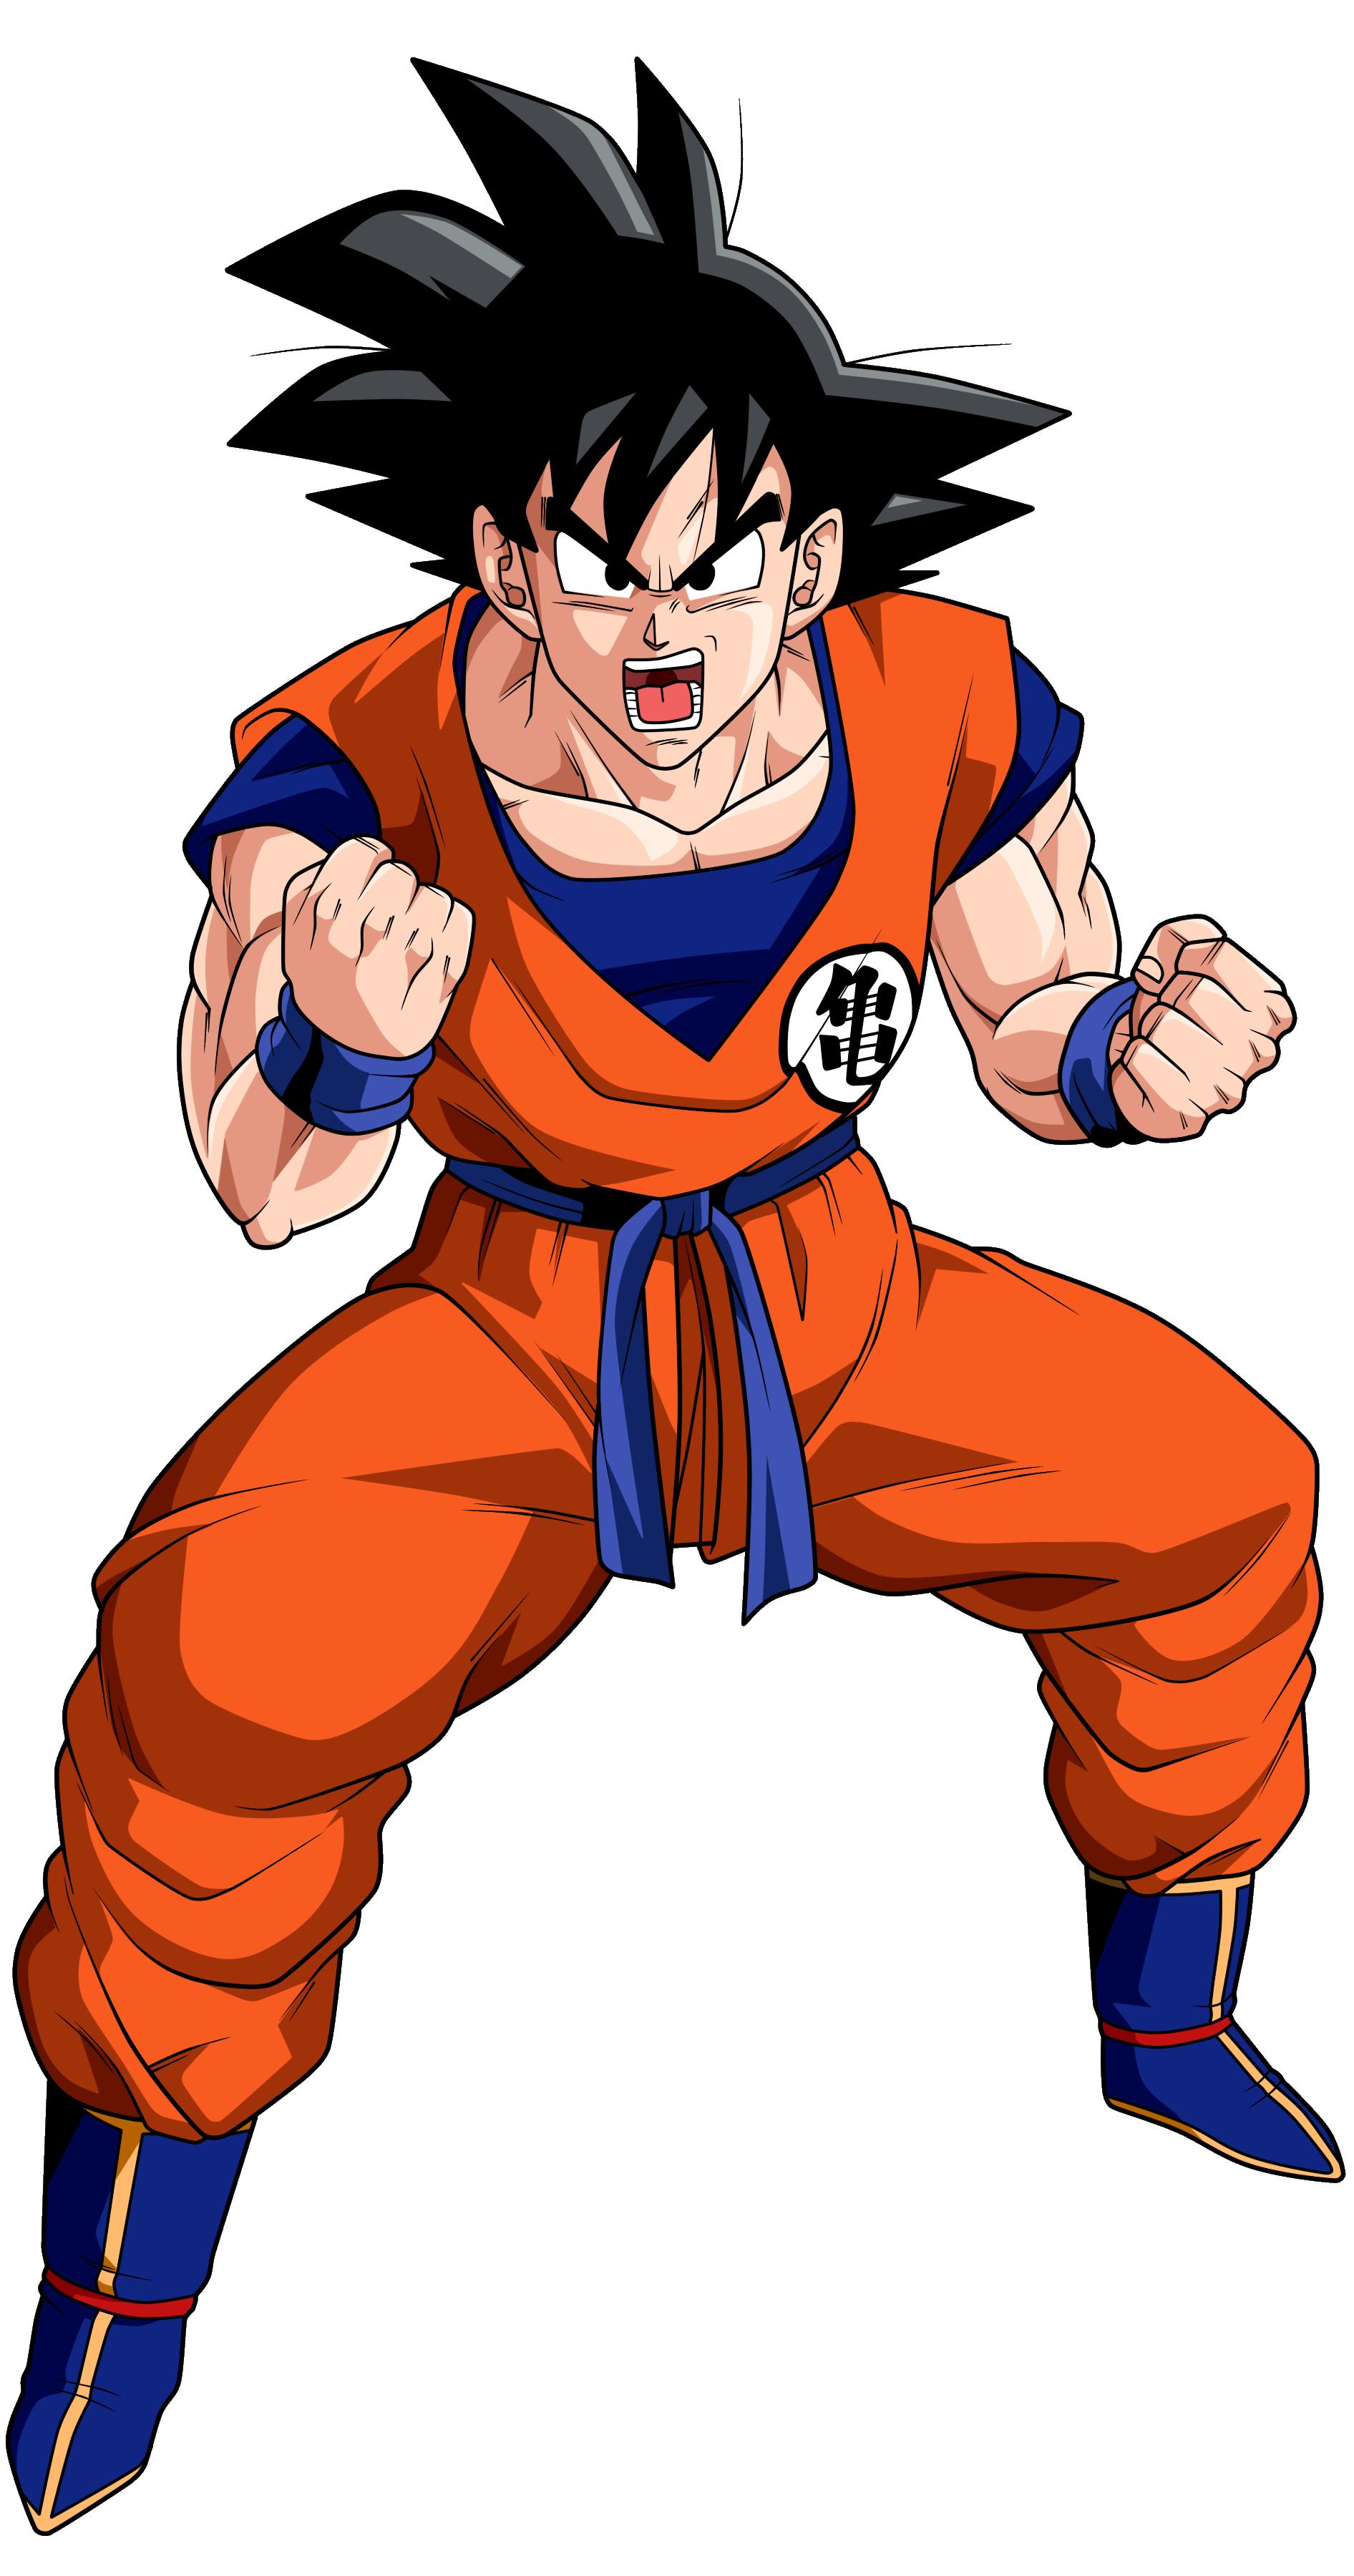 Latest 1892 3600 Dragon Ball Super Manga Dragon Ball Dragon Ball Z